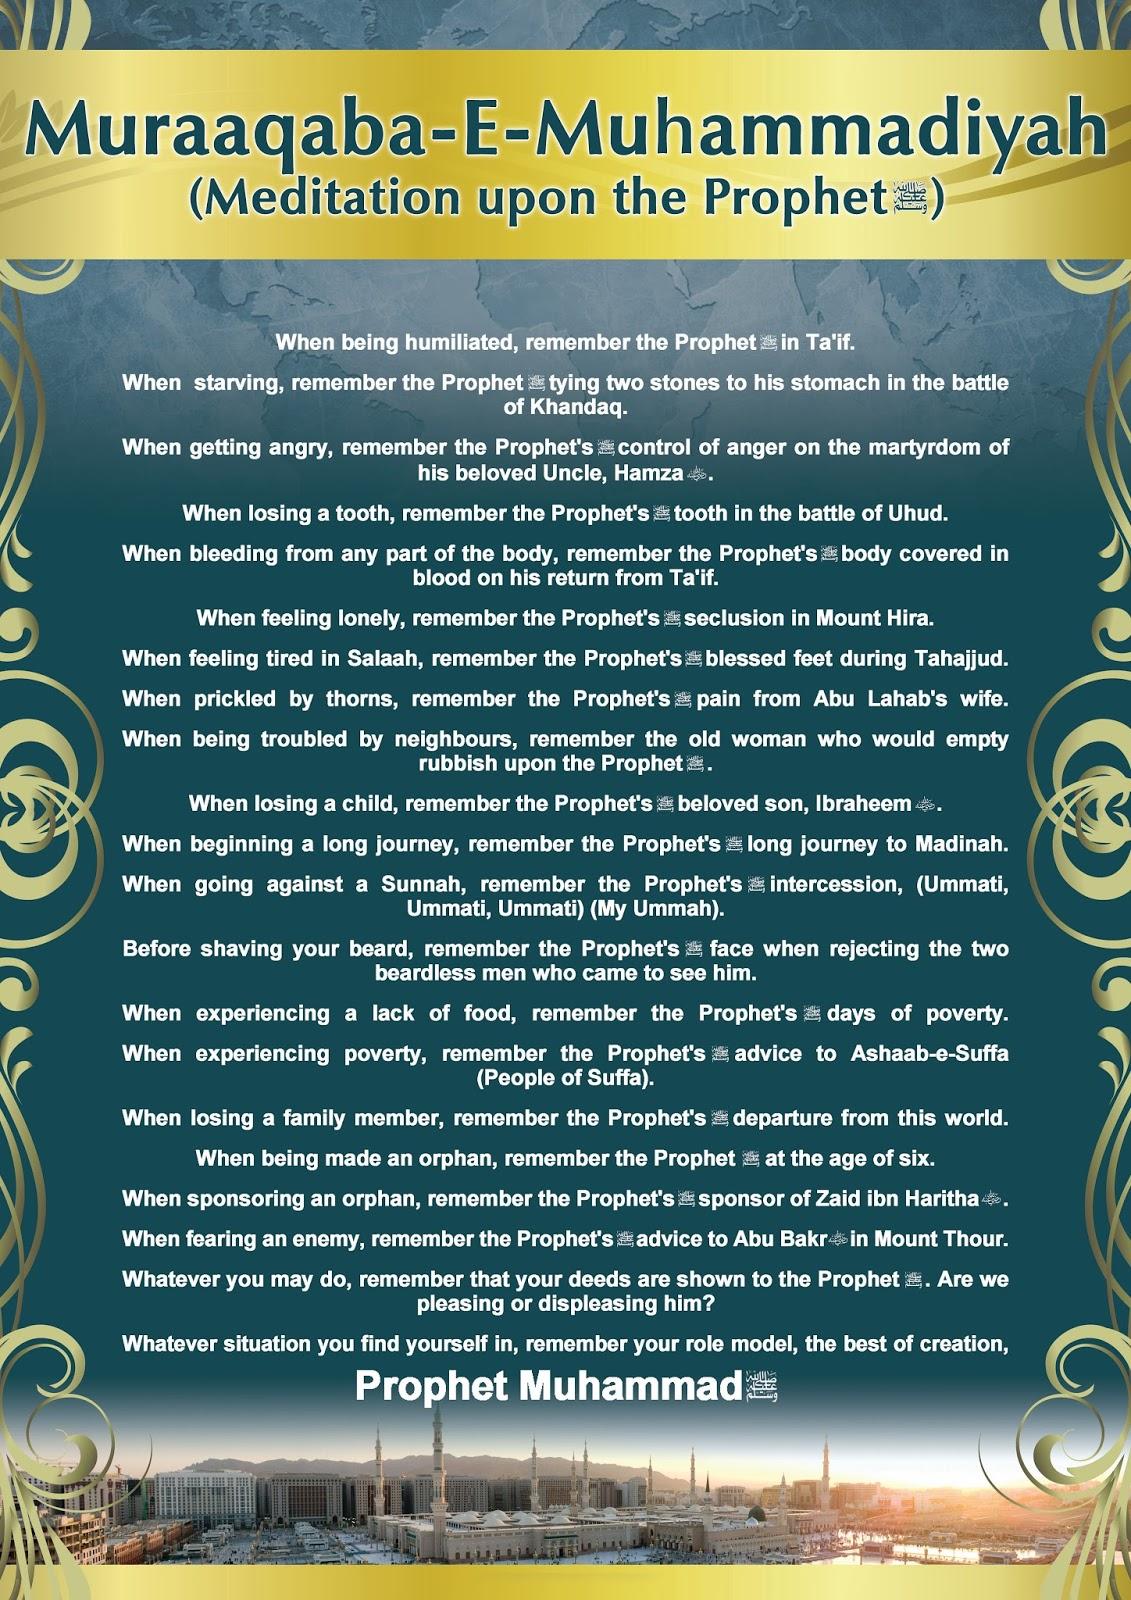 Muraaqaba-E-Muhammadiyah (Meditation upon the Prophets)